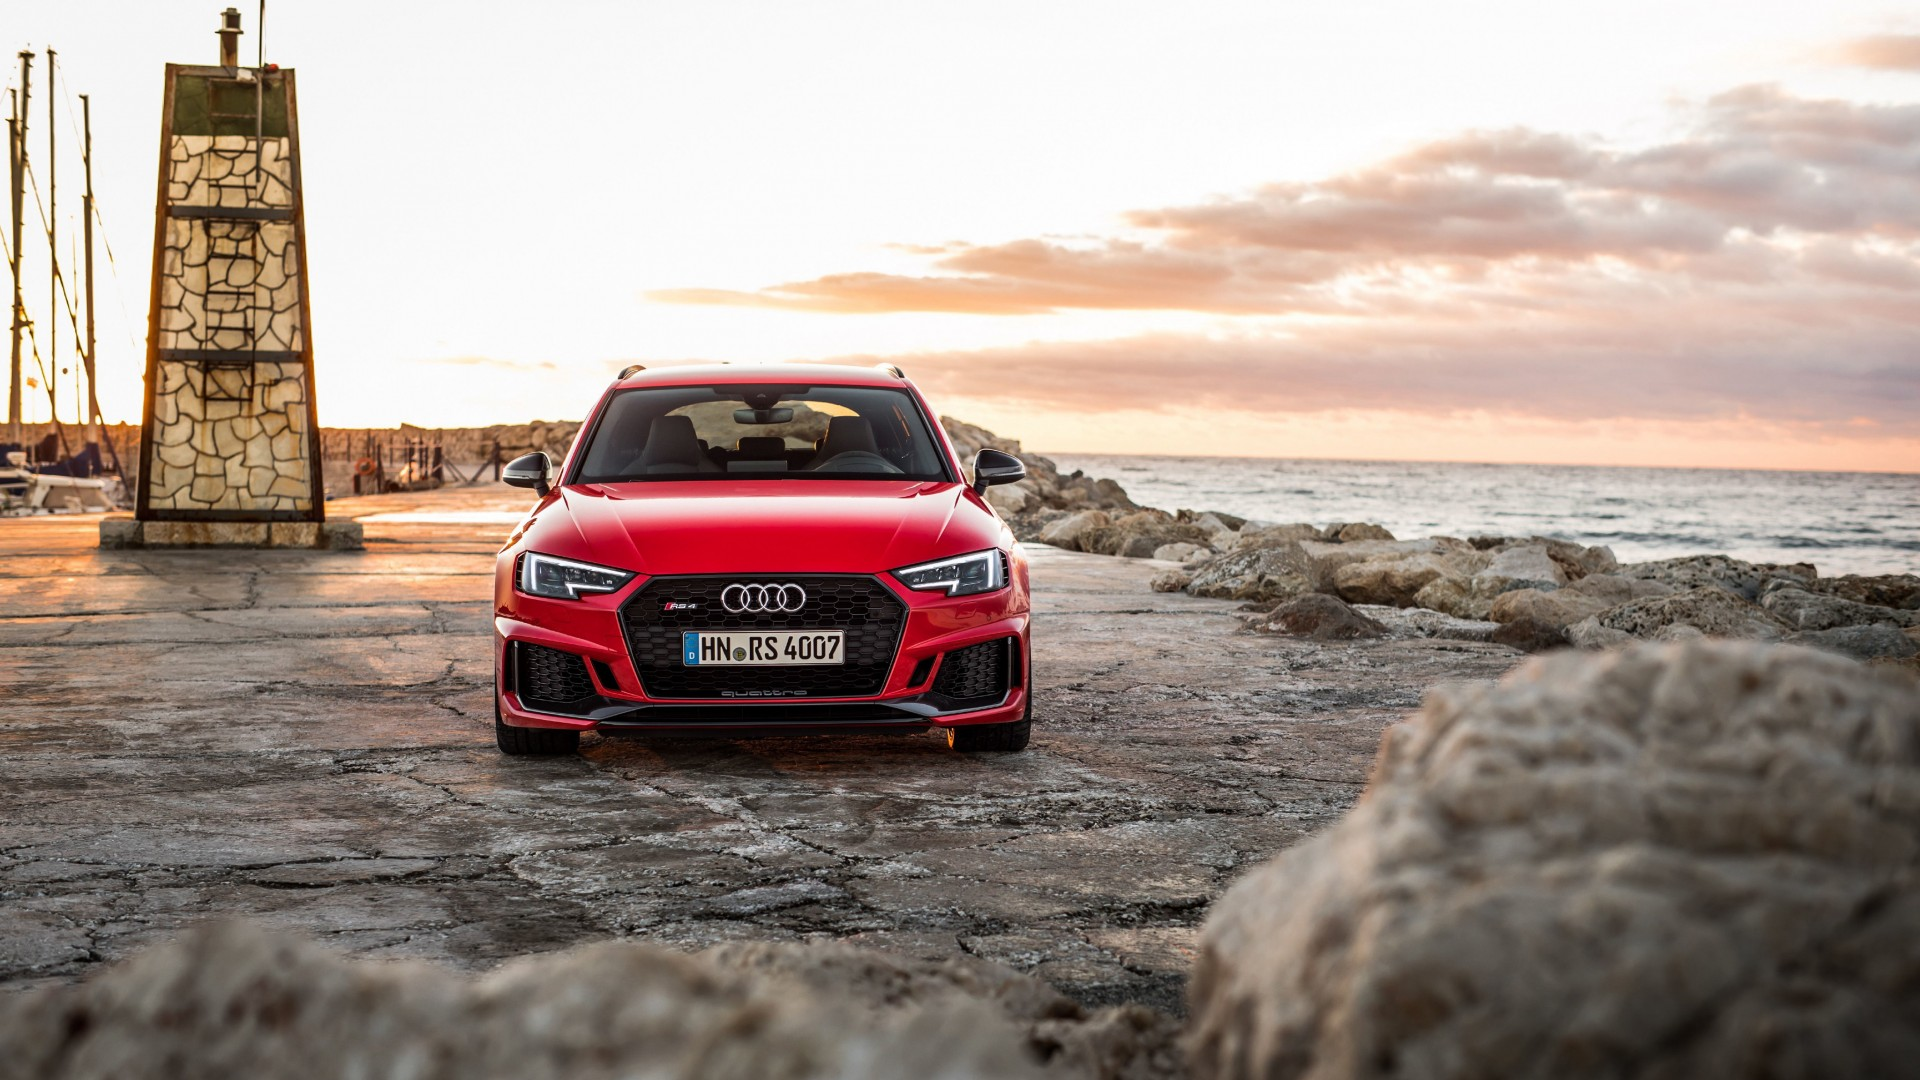 Audi rs4 avant 4k 2018 wallpaper hd car wallpapers id - Cars hd wallpapers for laptop ...